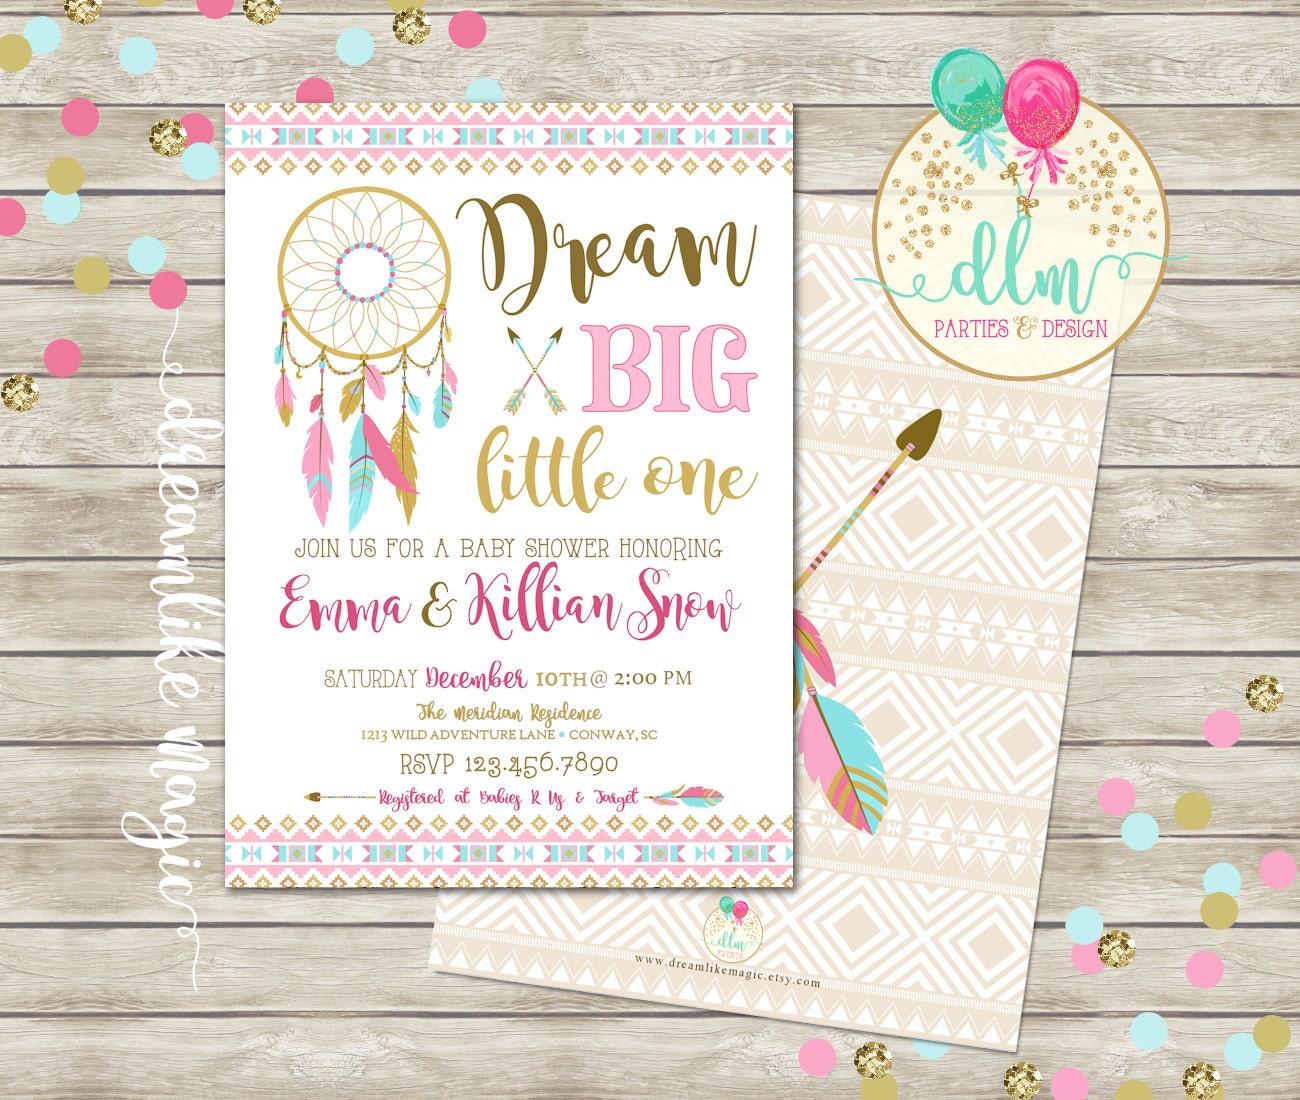 Dream Catcher Invitation Tribal Arrow Baby Shower Dream Big